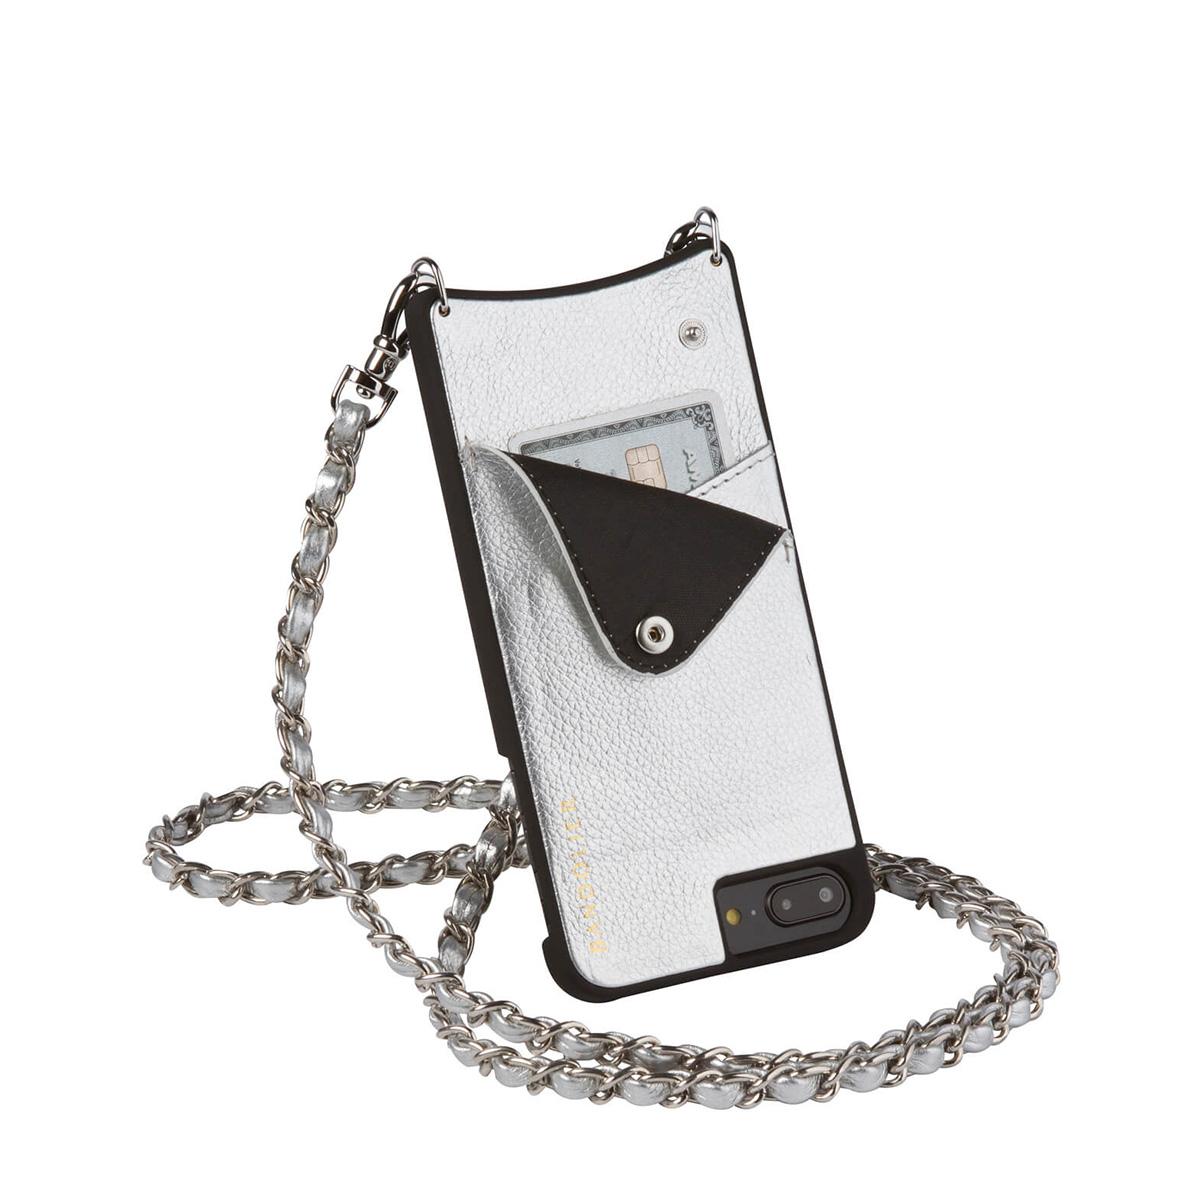 BANDOLIER iPhone8 iPhone7 6s LUCY RICH SILVER バンドリヤー ケース スマホ アイフォン メンズ レディース [1811]